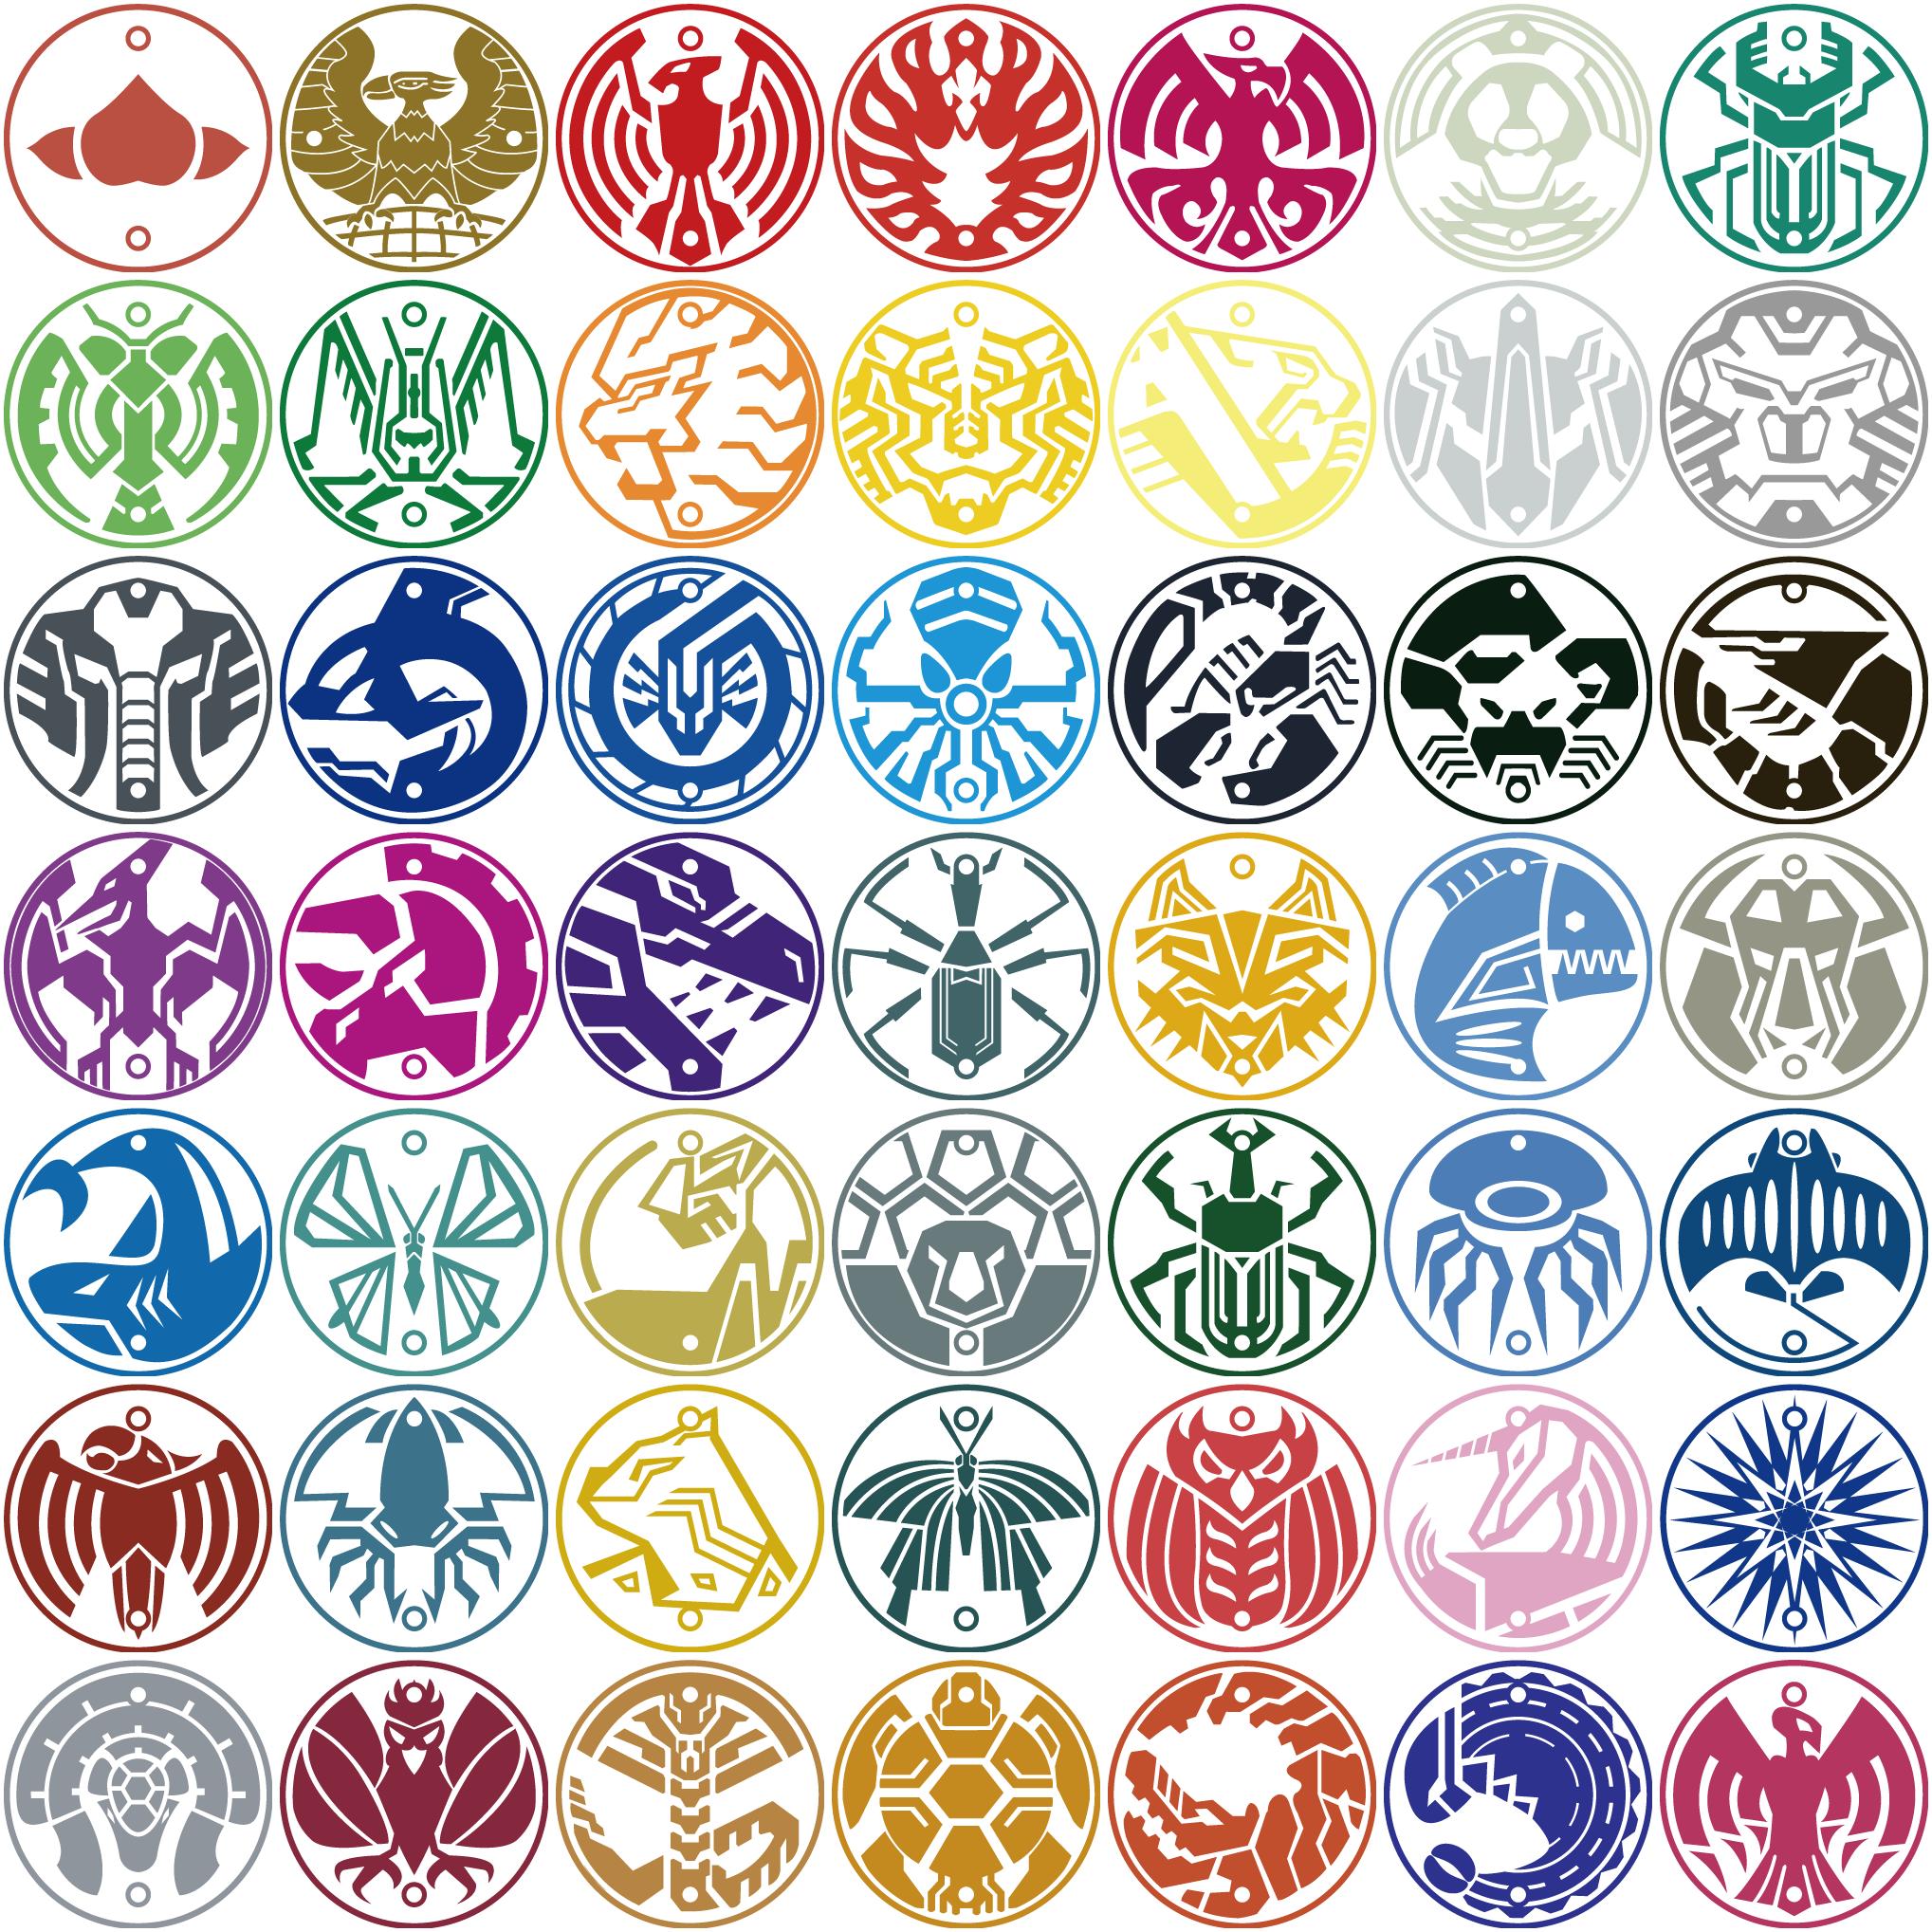 symbols of the wild by prehistoricjack on deviantart